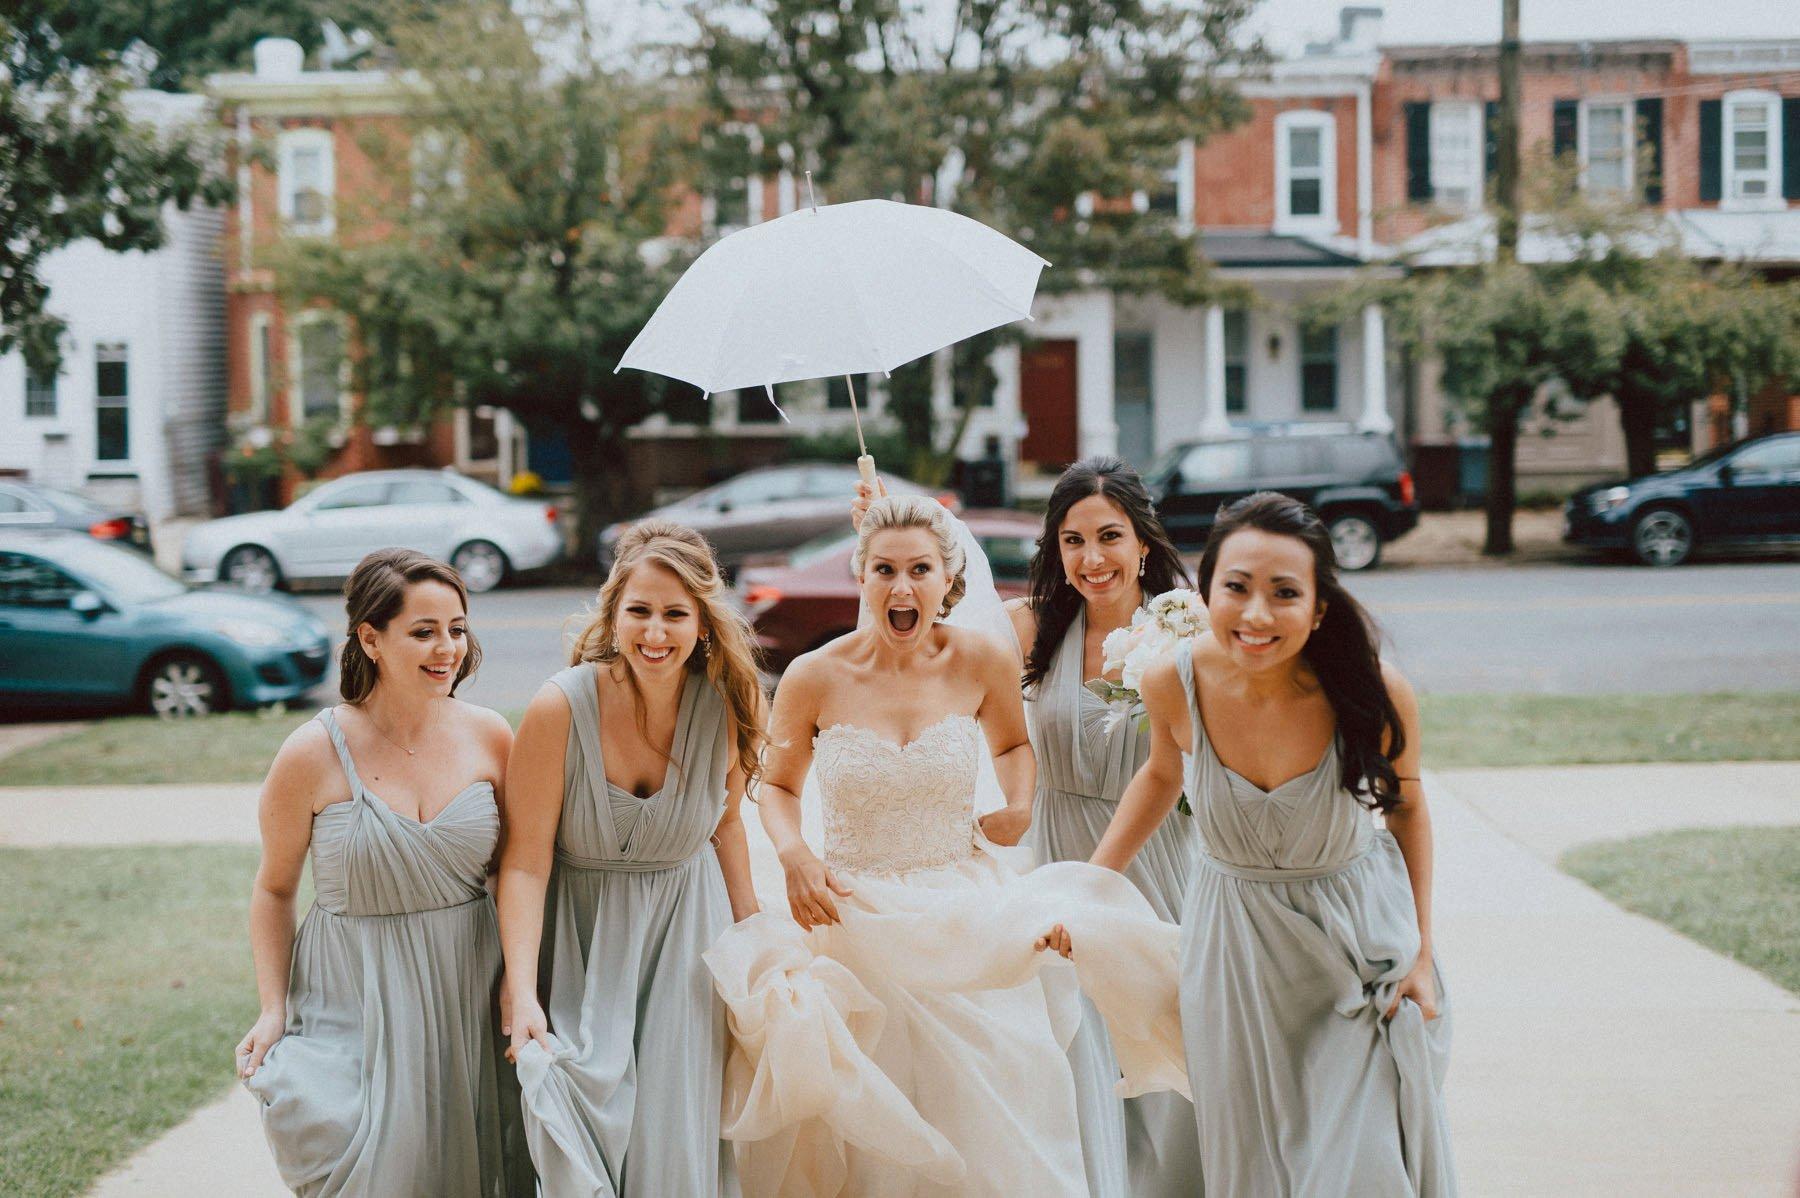 greenville-country-club-wedding-40.jpg